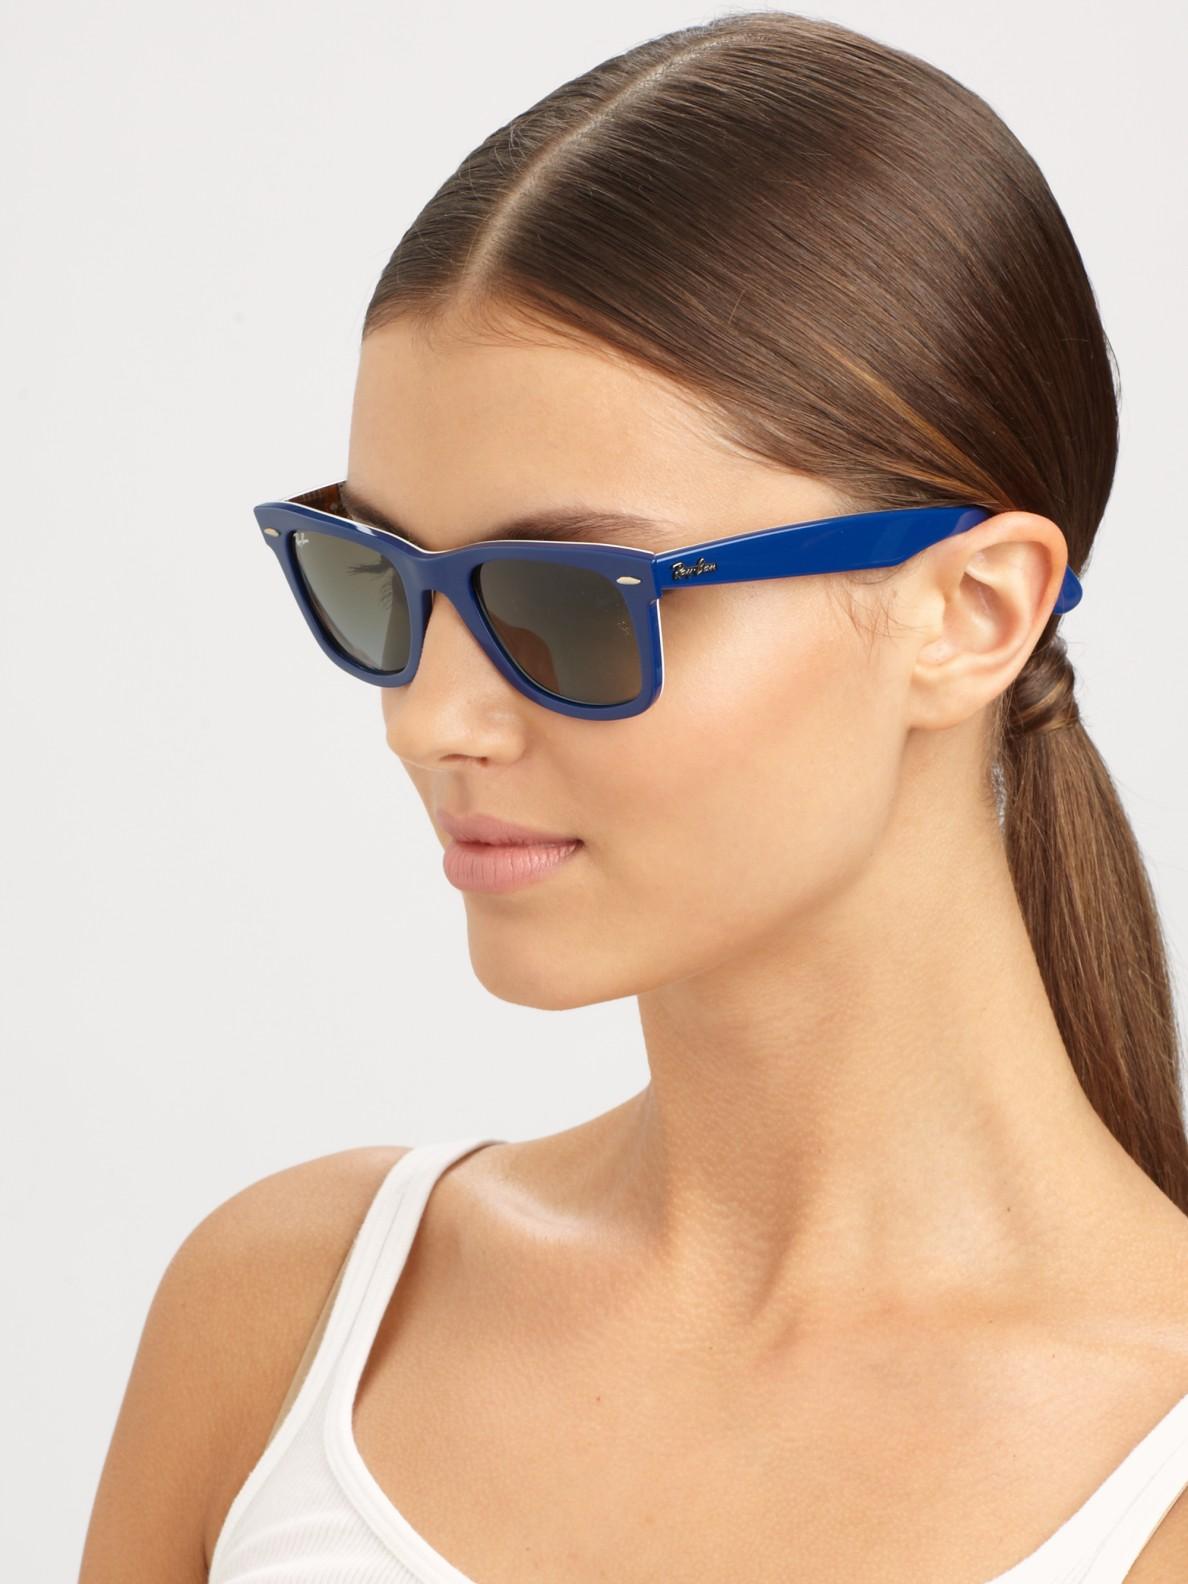 classic wayfarer  Ray-ban Classic Wayfarer Guitar Print Sunglasses in Blue